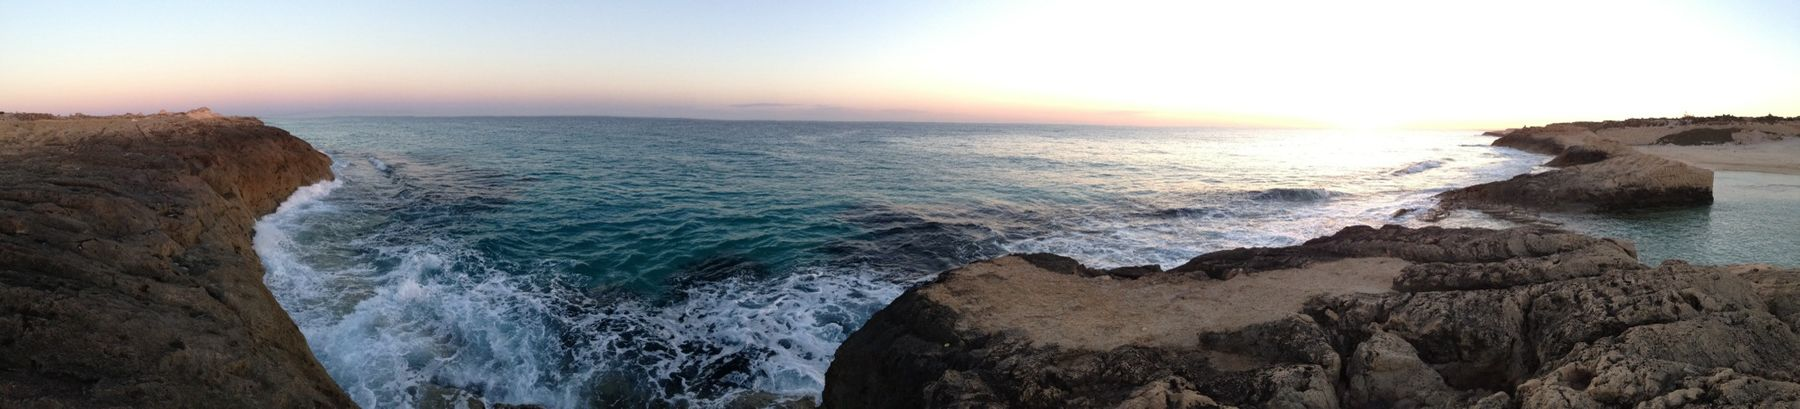 Sun Rise Sea View